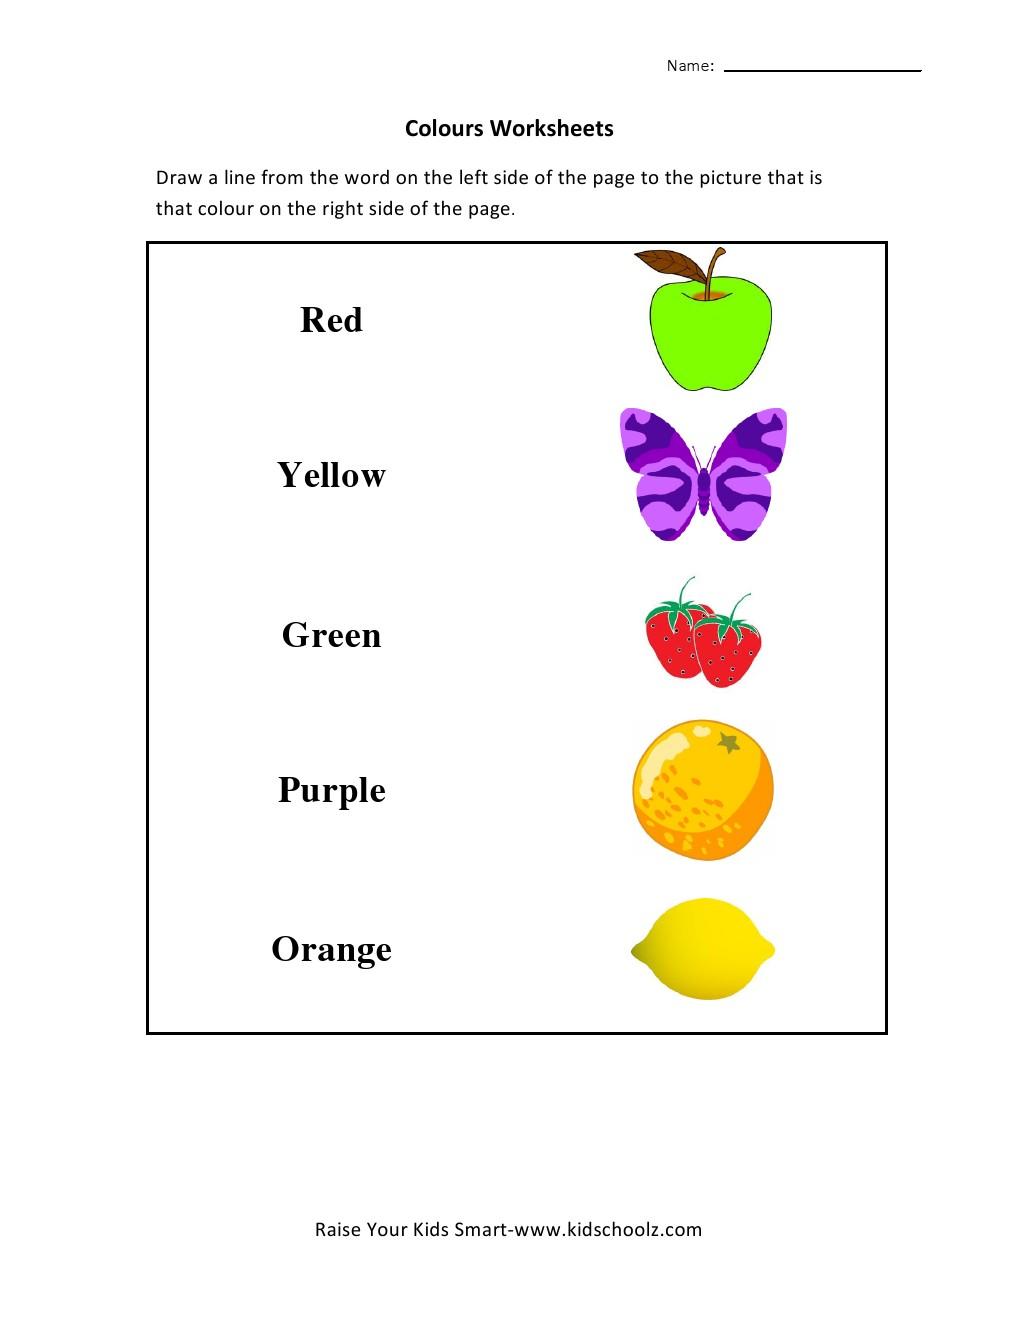 Best Downlo D K Derg Rten Science W Ksheets Colours M Tch G